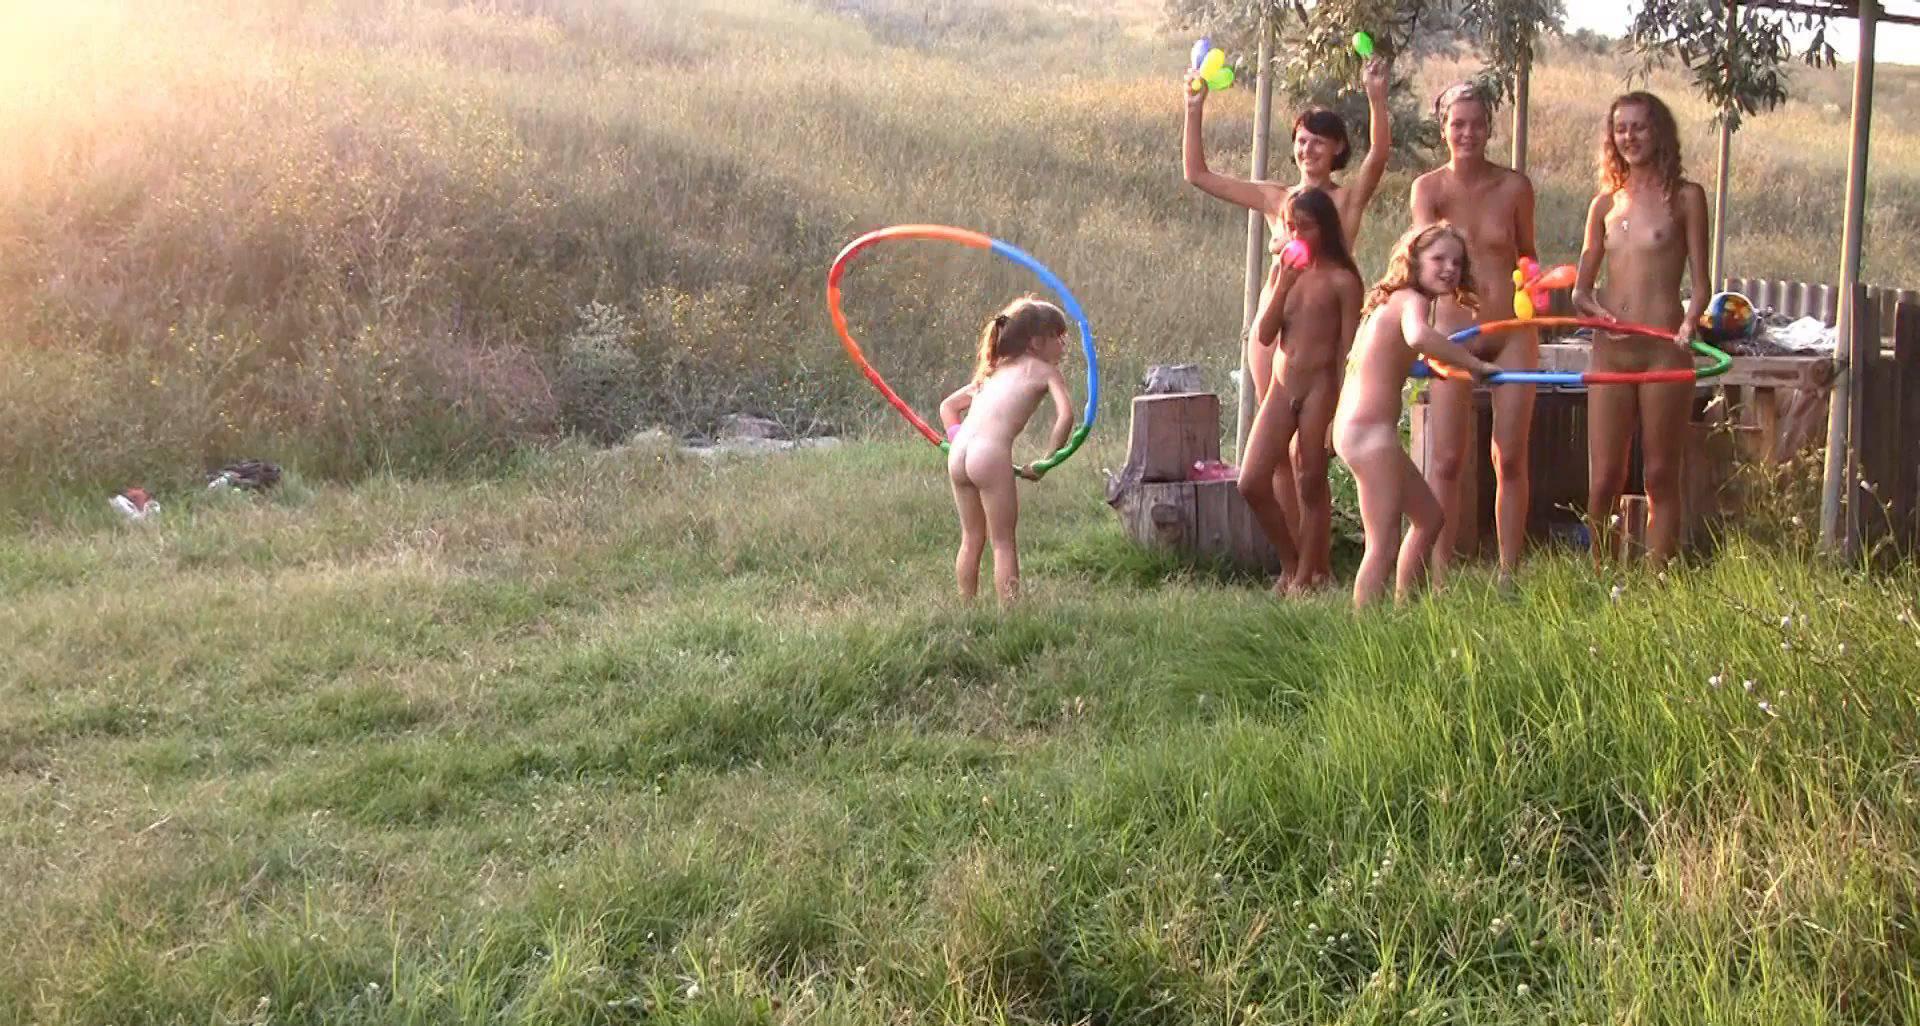 Nudist Movies Countryside Lounging 2 - 1